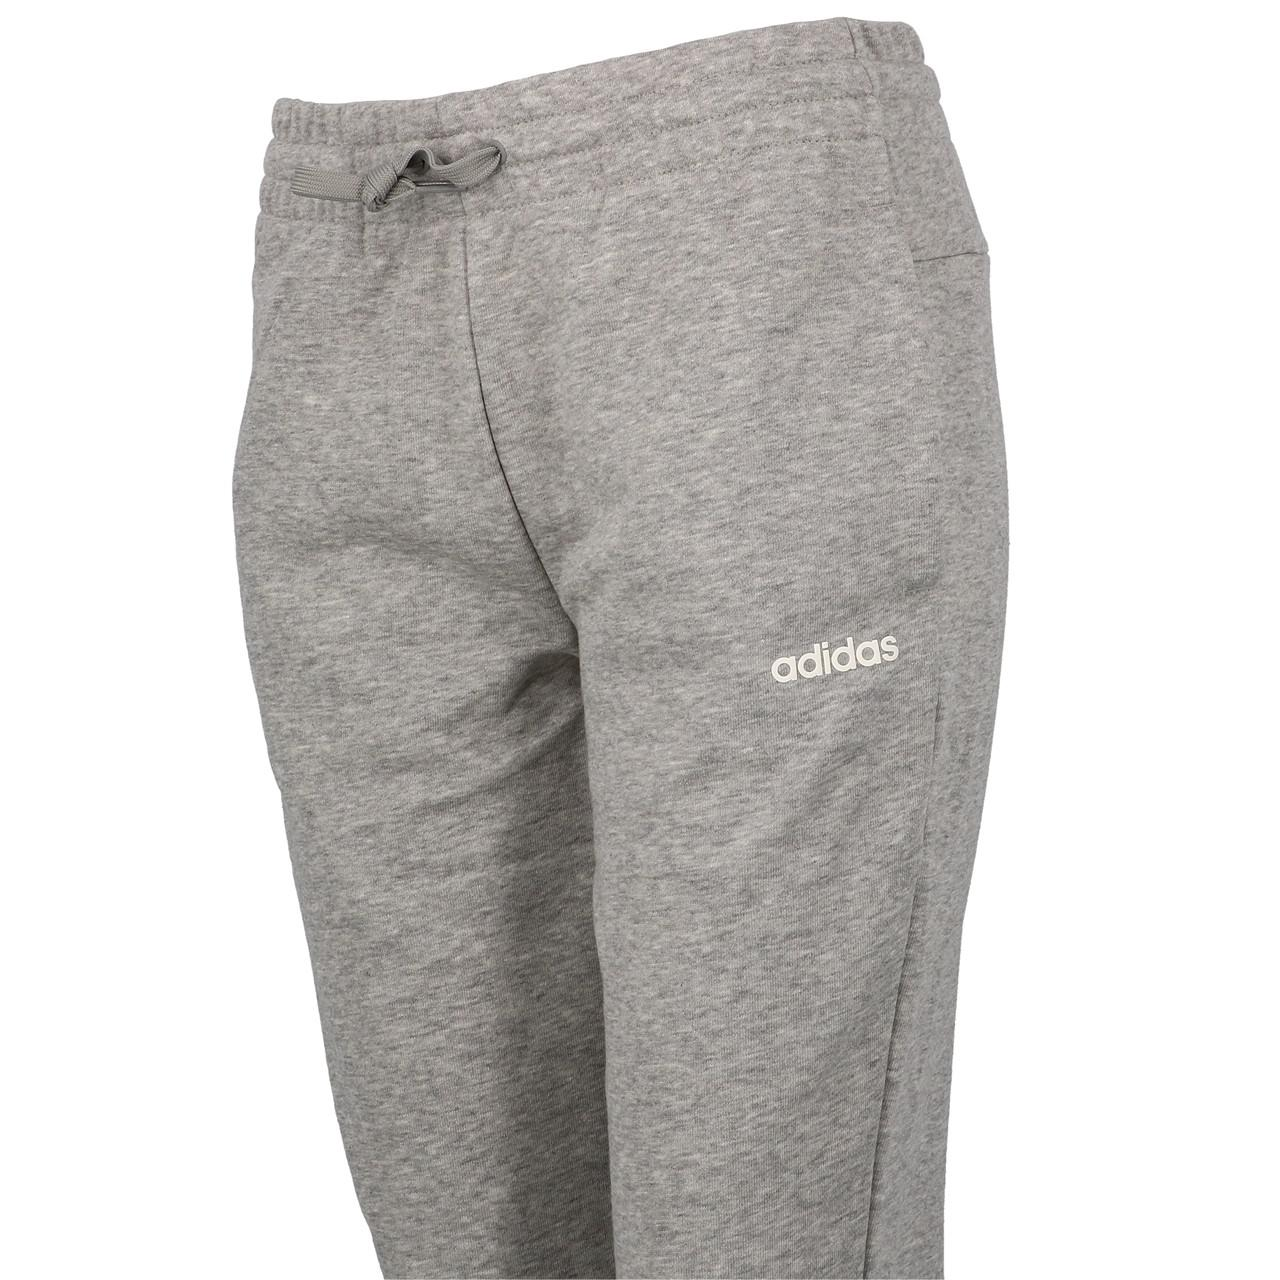 Pantalon-de-survetement-Adidas-E-pln-pant-grey-mel-l-Gris-18973-Neuf miniature 3